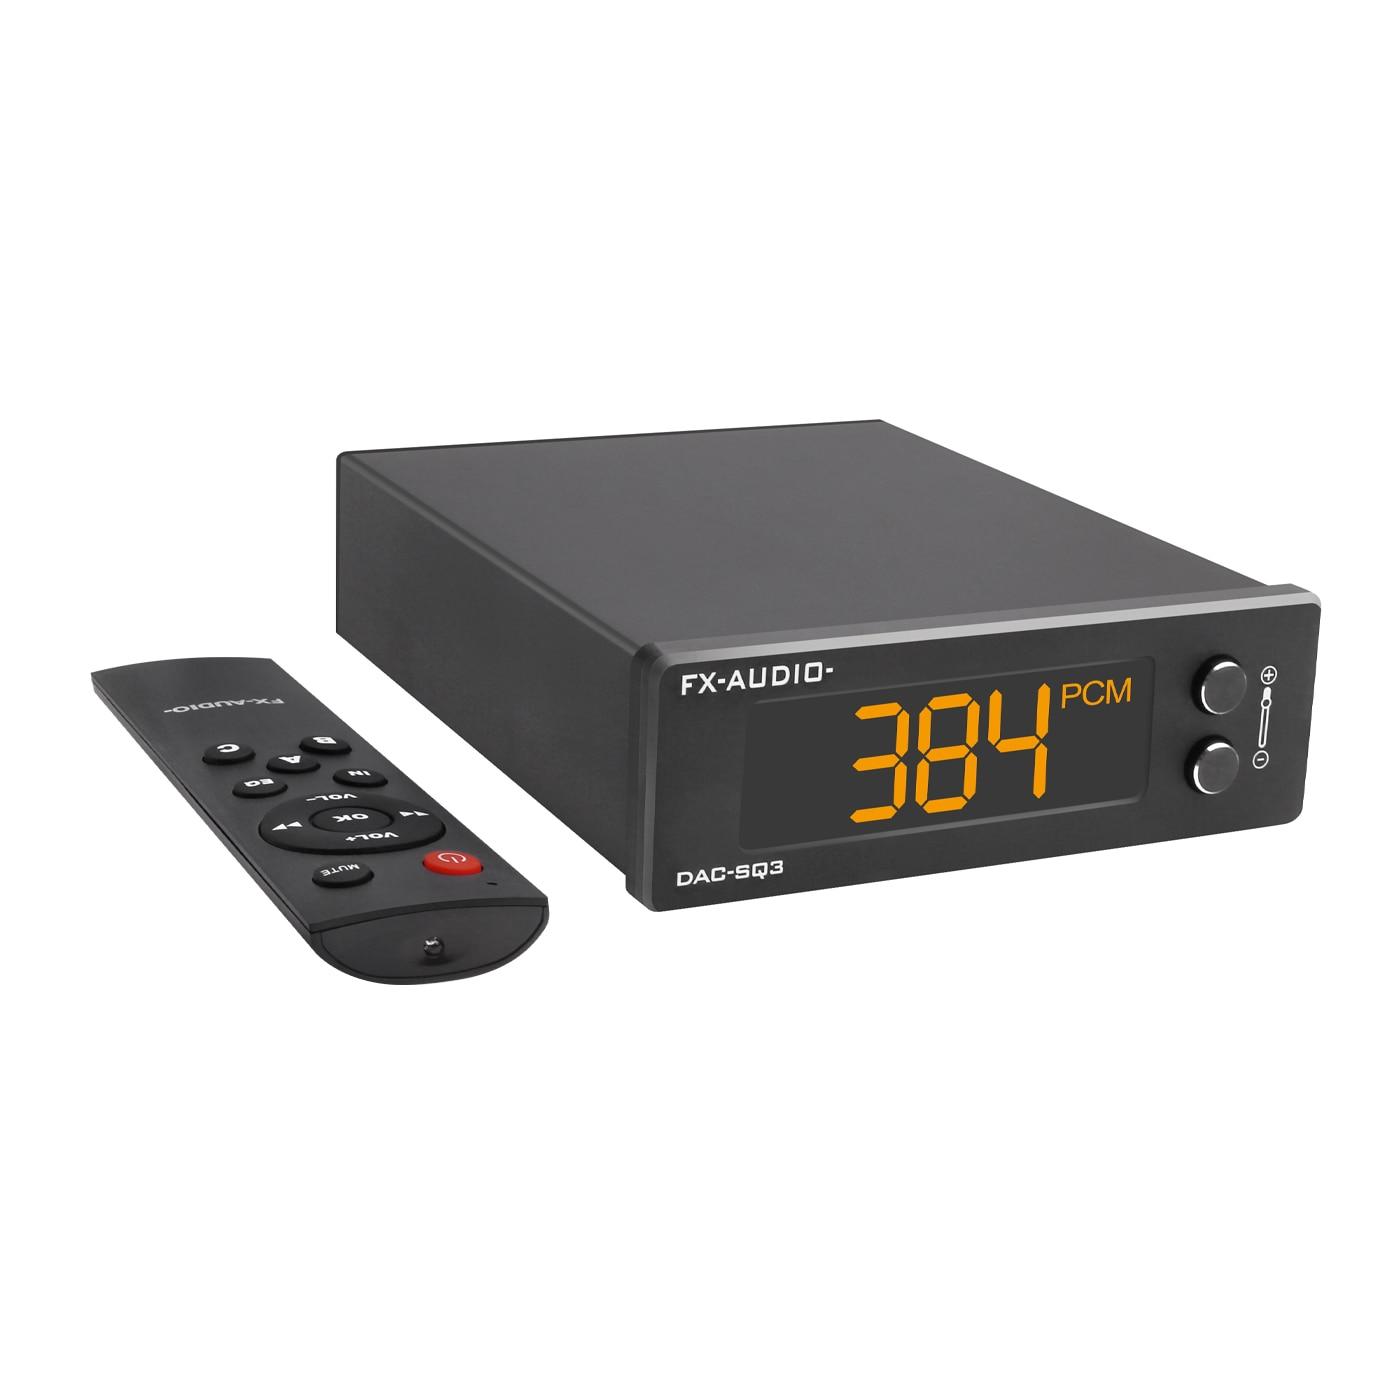 FX-AUDIO DAC-SQ3 USB صغير DAC ES9038Q2M XMOS XU208 LM49720A PCM 32Bit/384kHz DSD256 الصوت HIFI فك